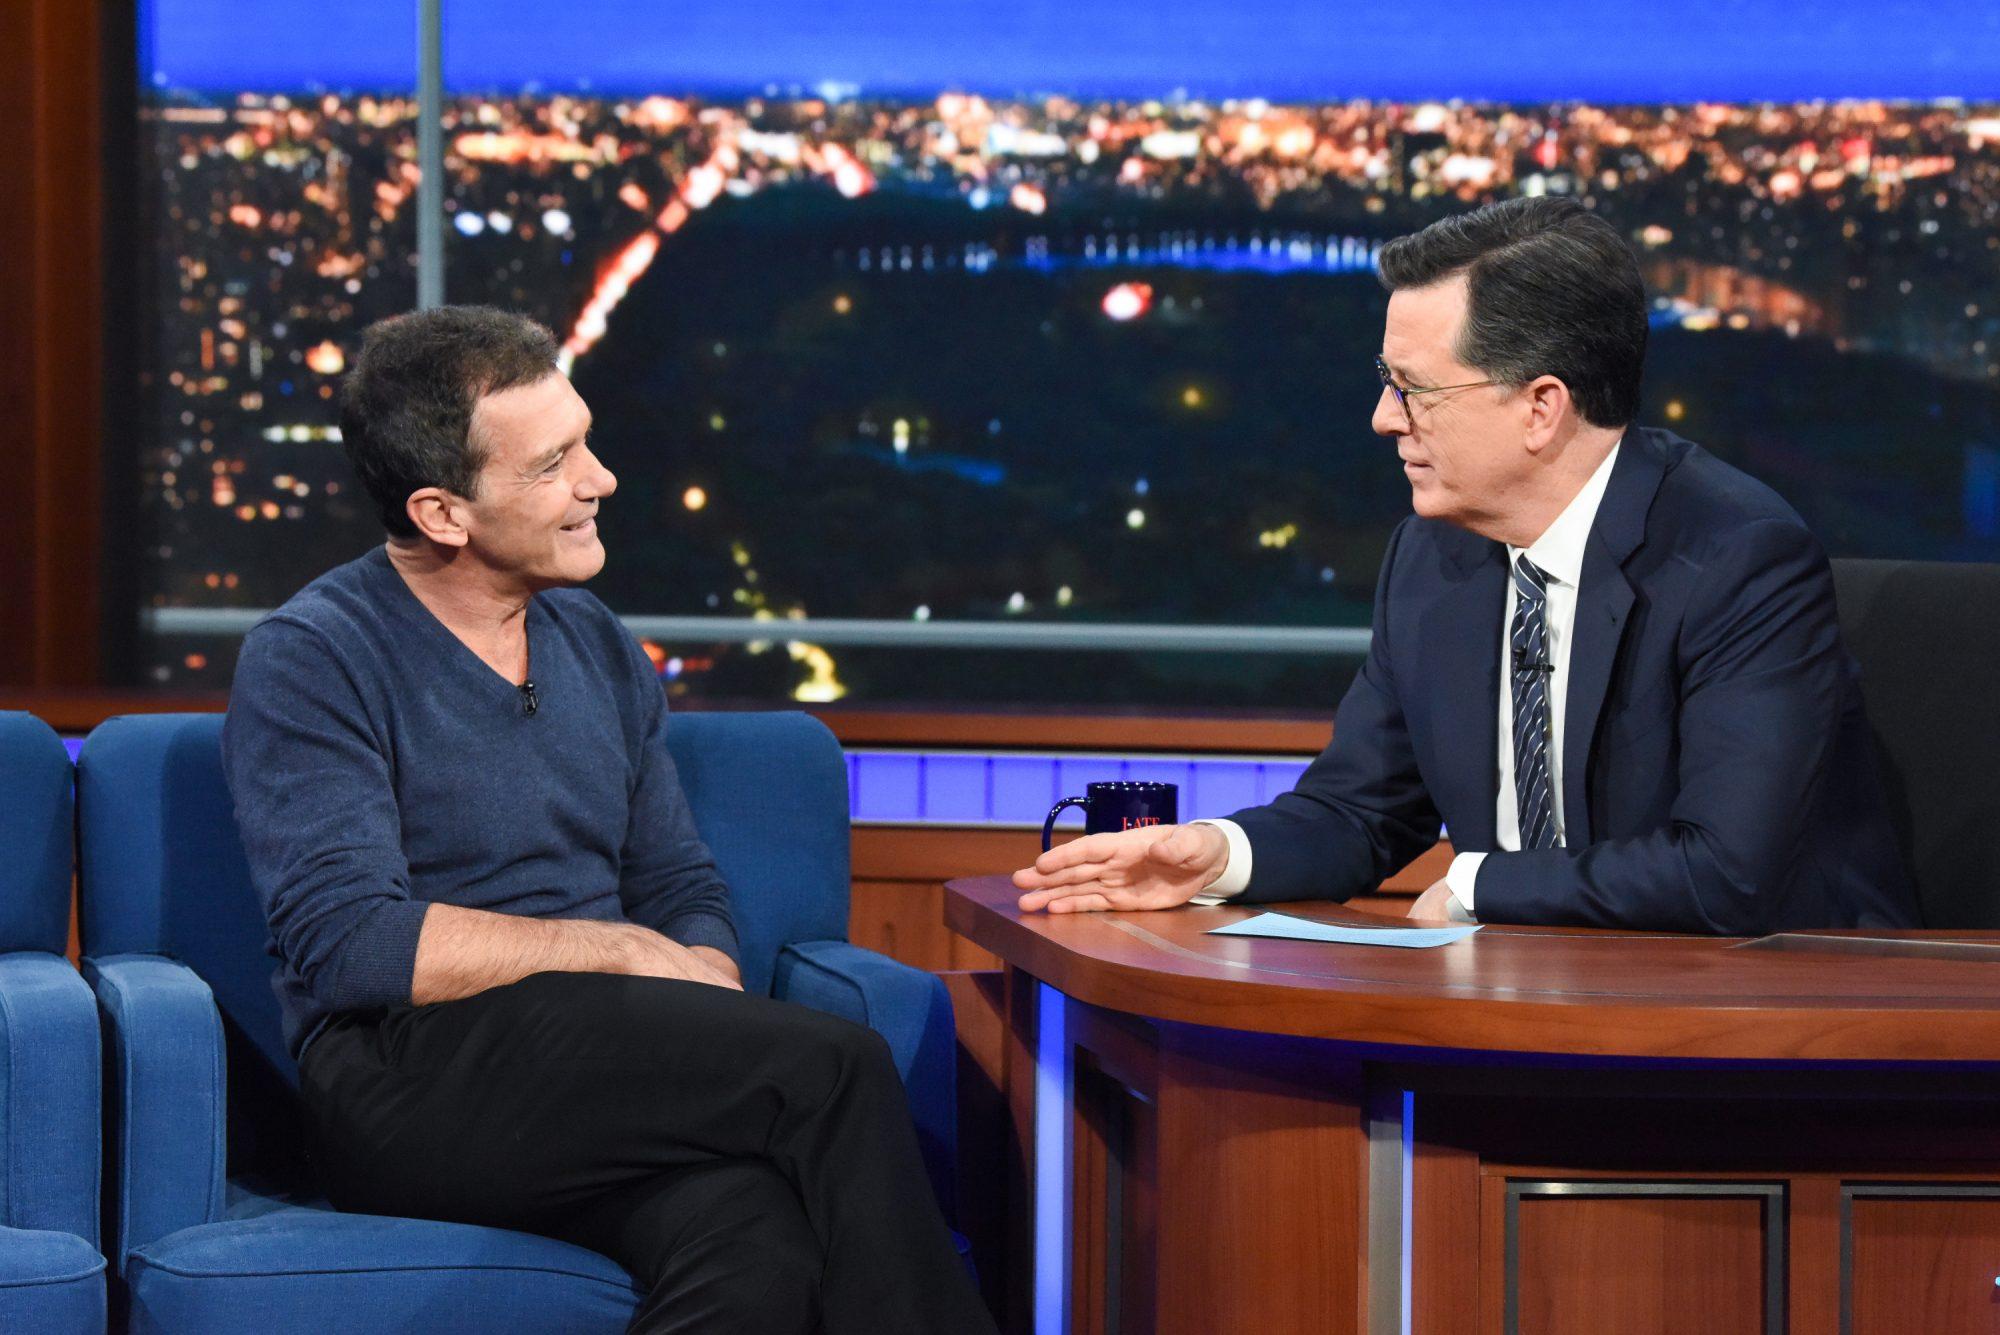 Antonio Banderas, Stephen Colbert